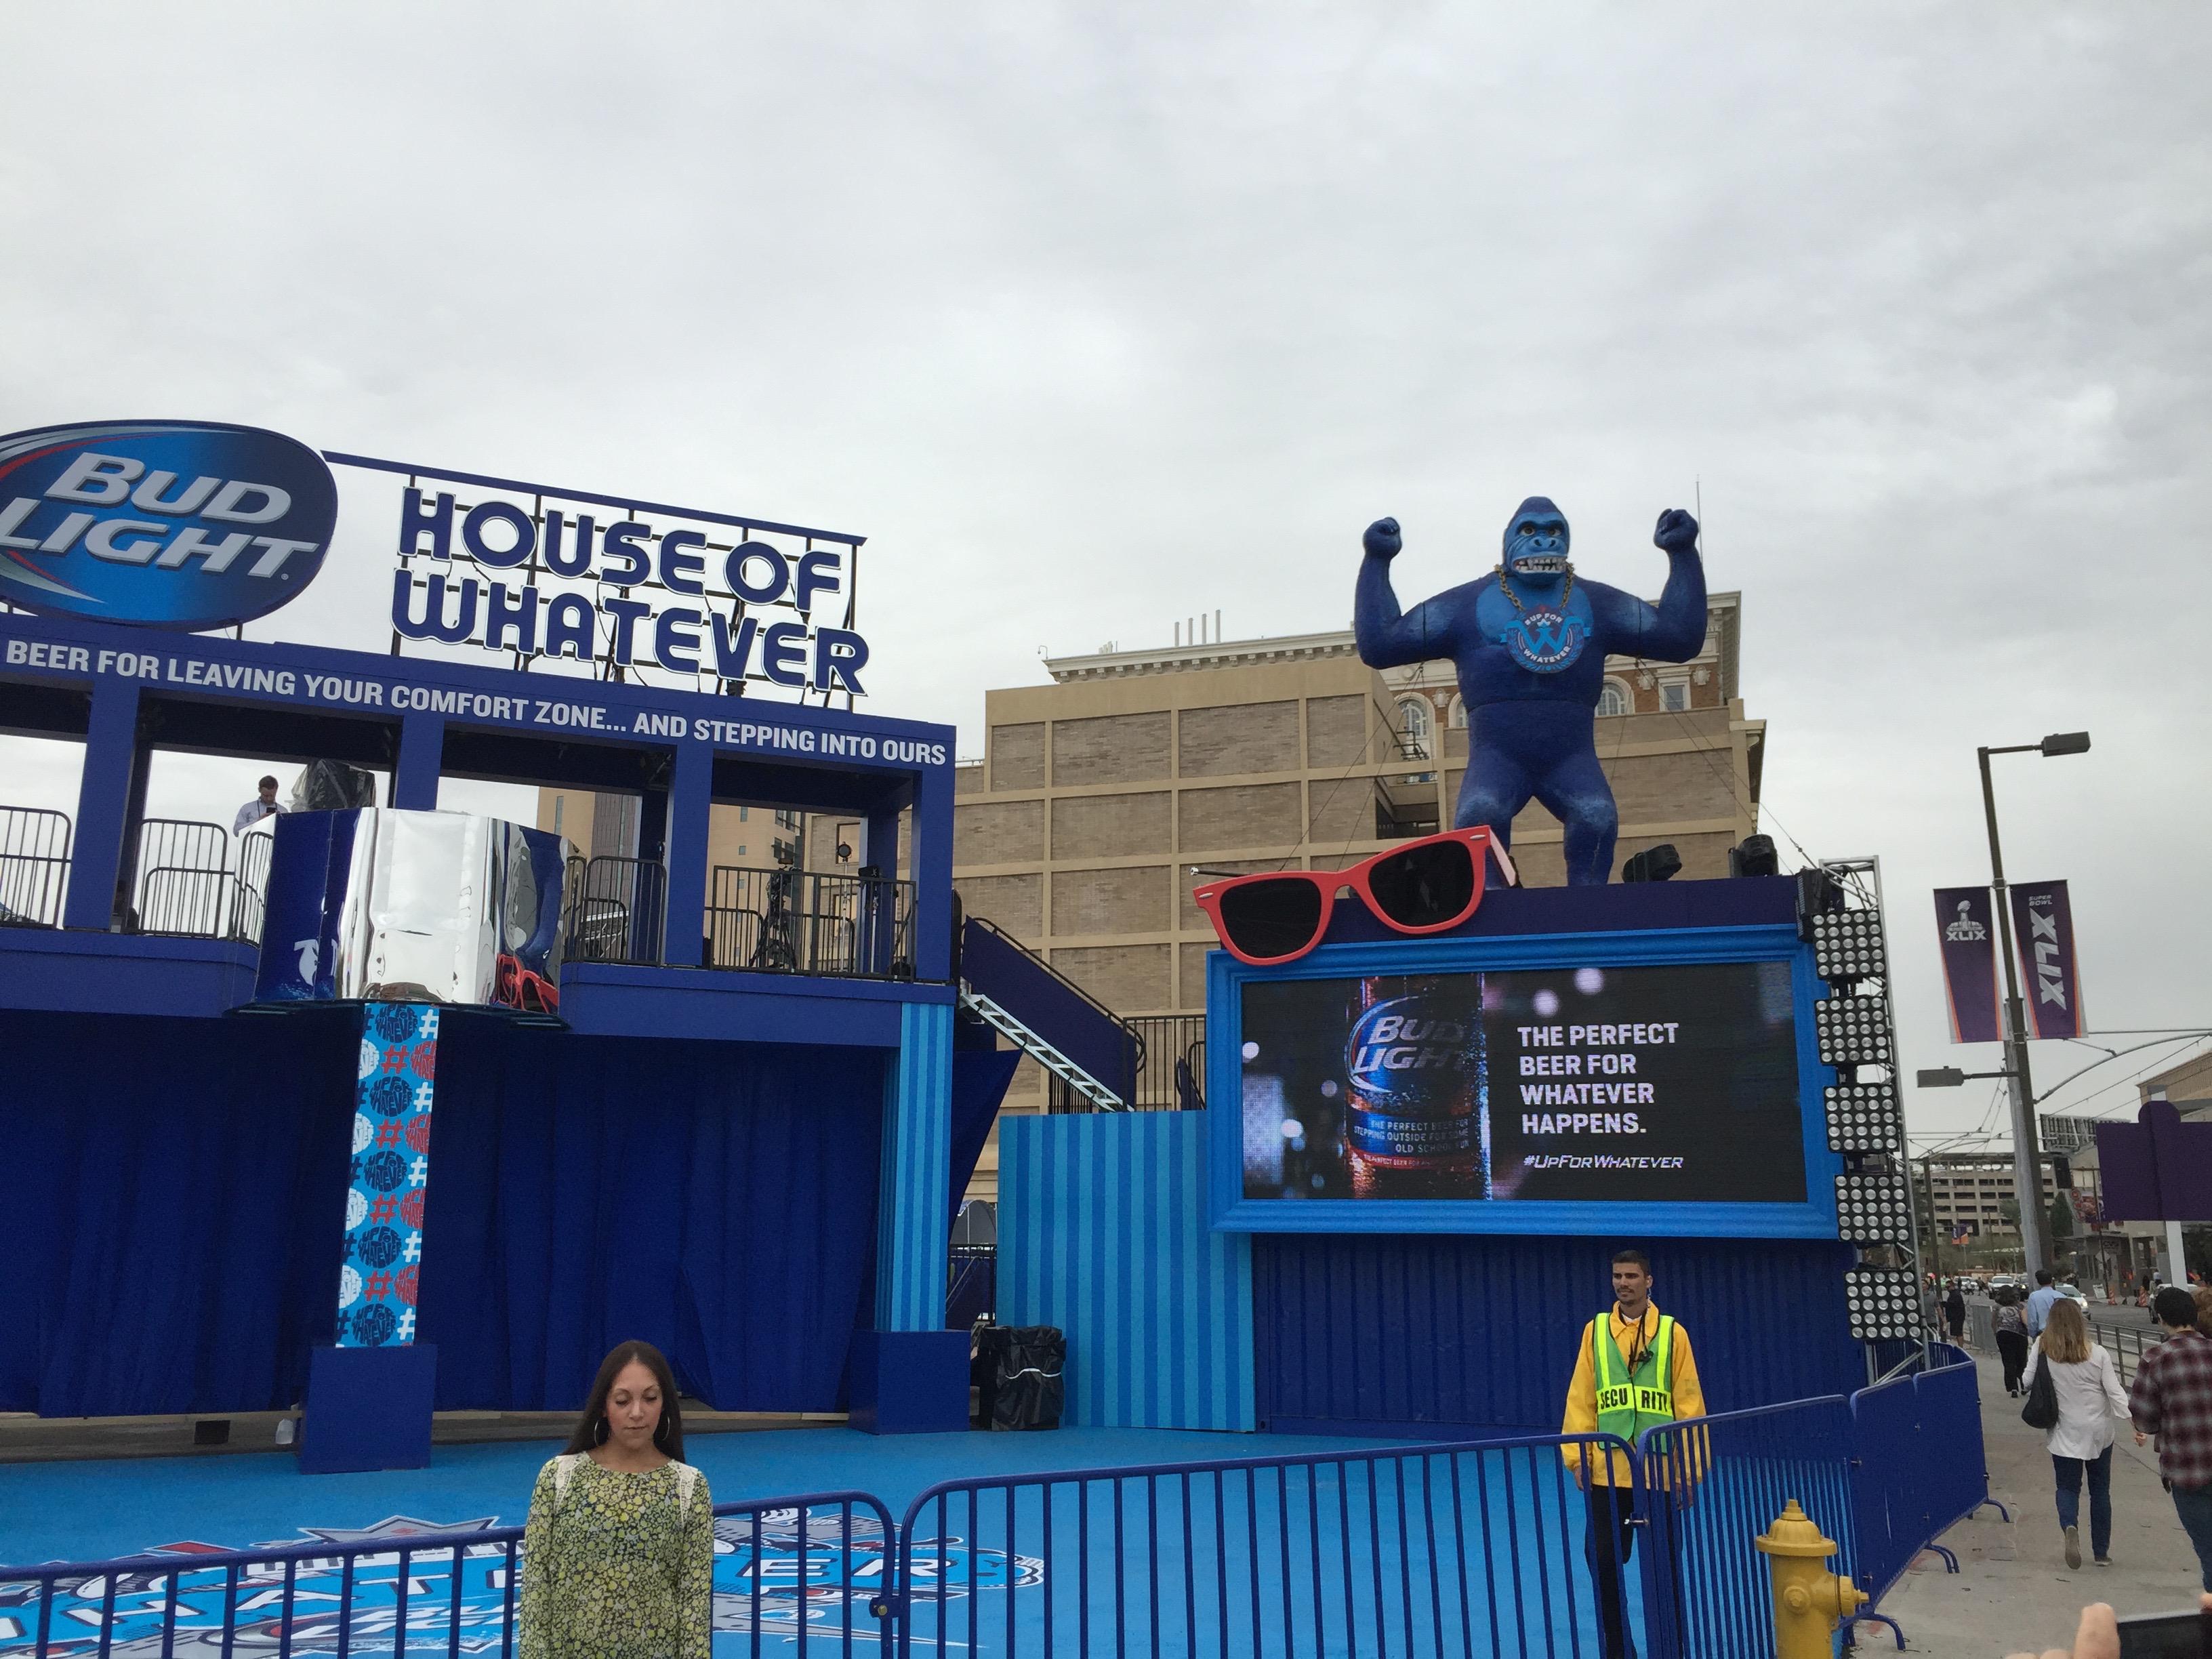 Super Bowl XLIX – Bud Light House of Whatever